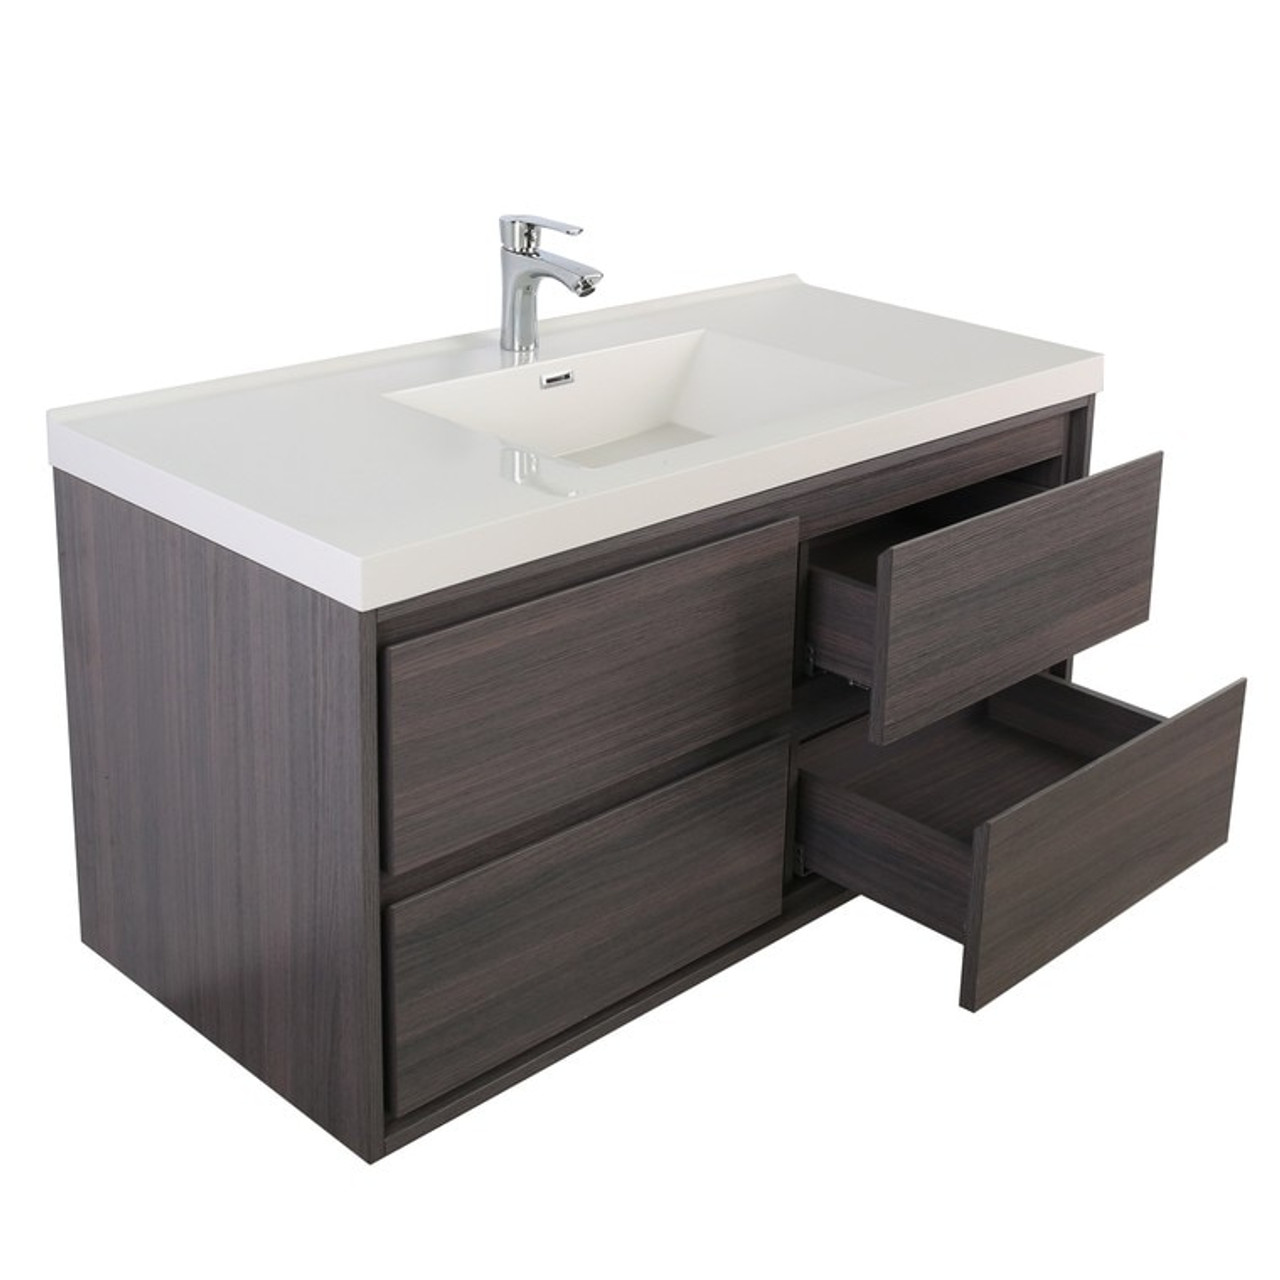 Sage 48 Single Sink Wall Mounted Modern Vanity